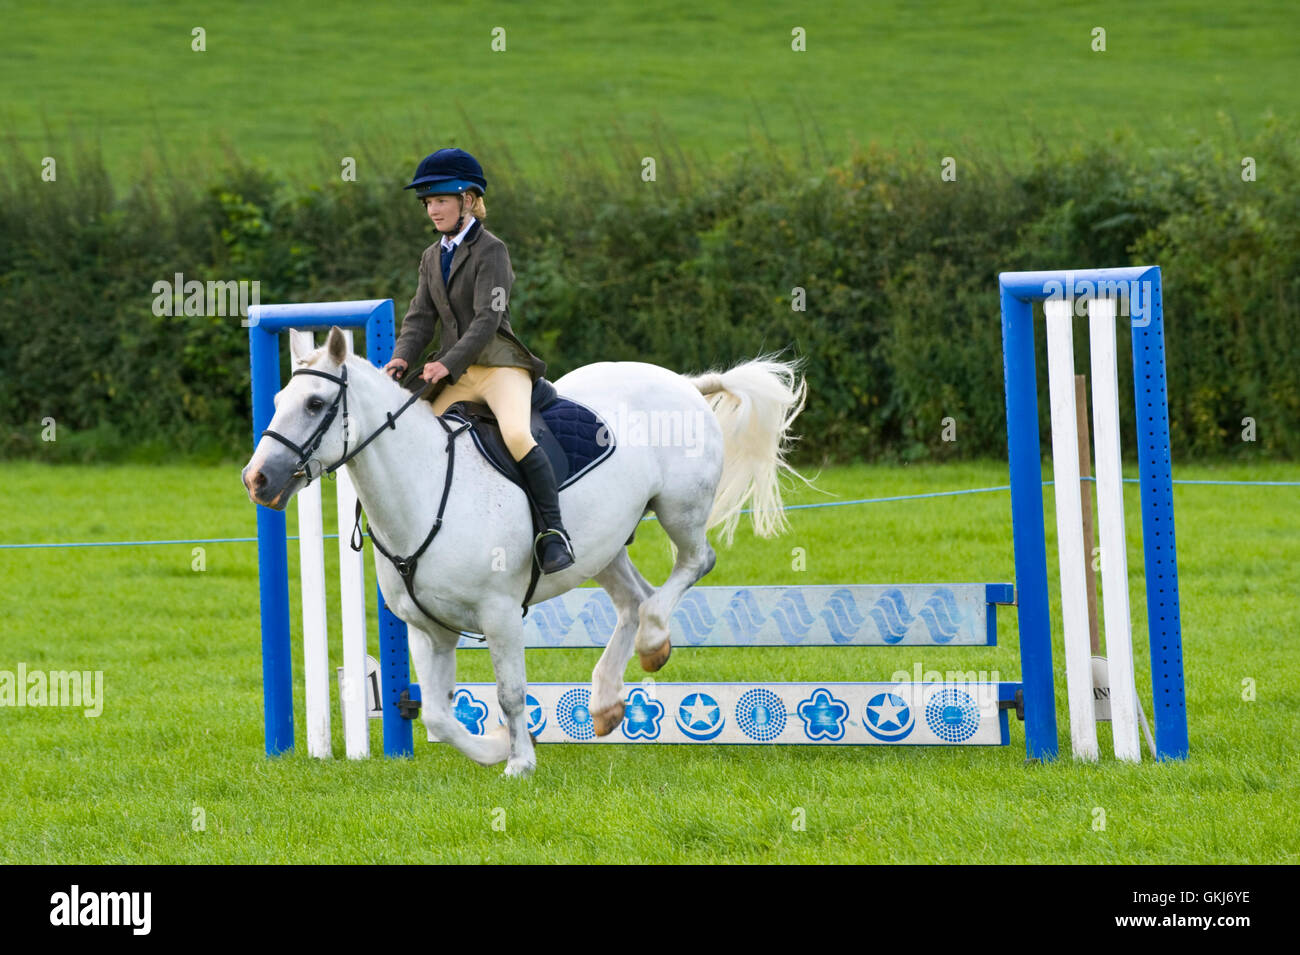 Ragazza adolescente show jumping sul suo pony a Llanigon YFC Show 2016 nr Hay-on-Wye Powys Wales UK Immagini Stock